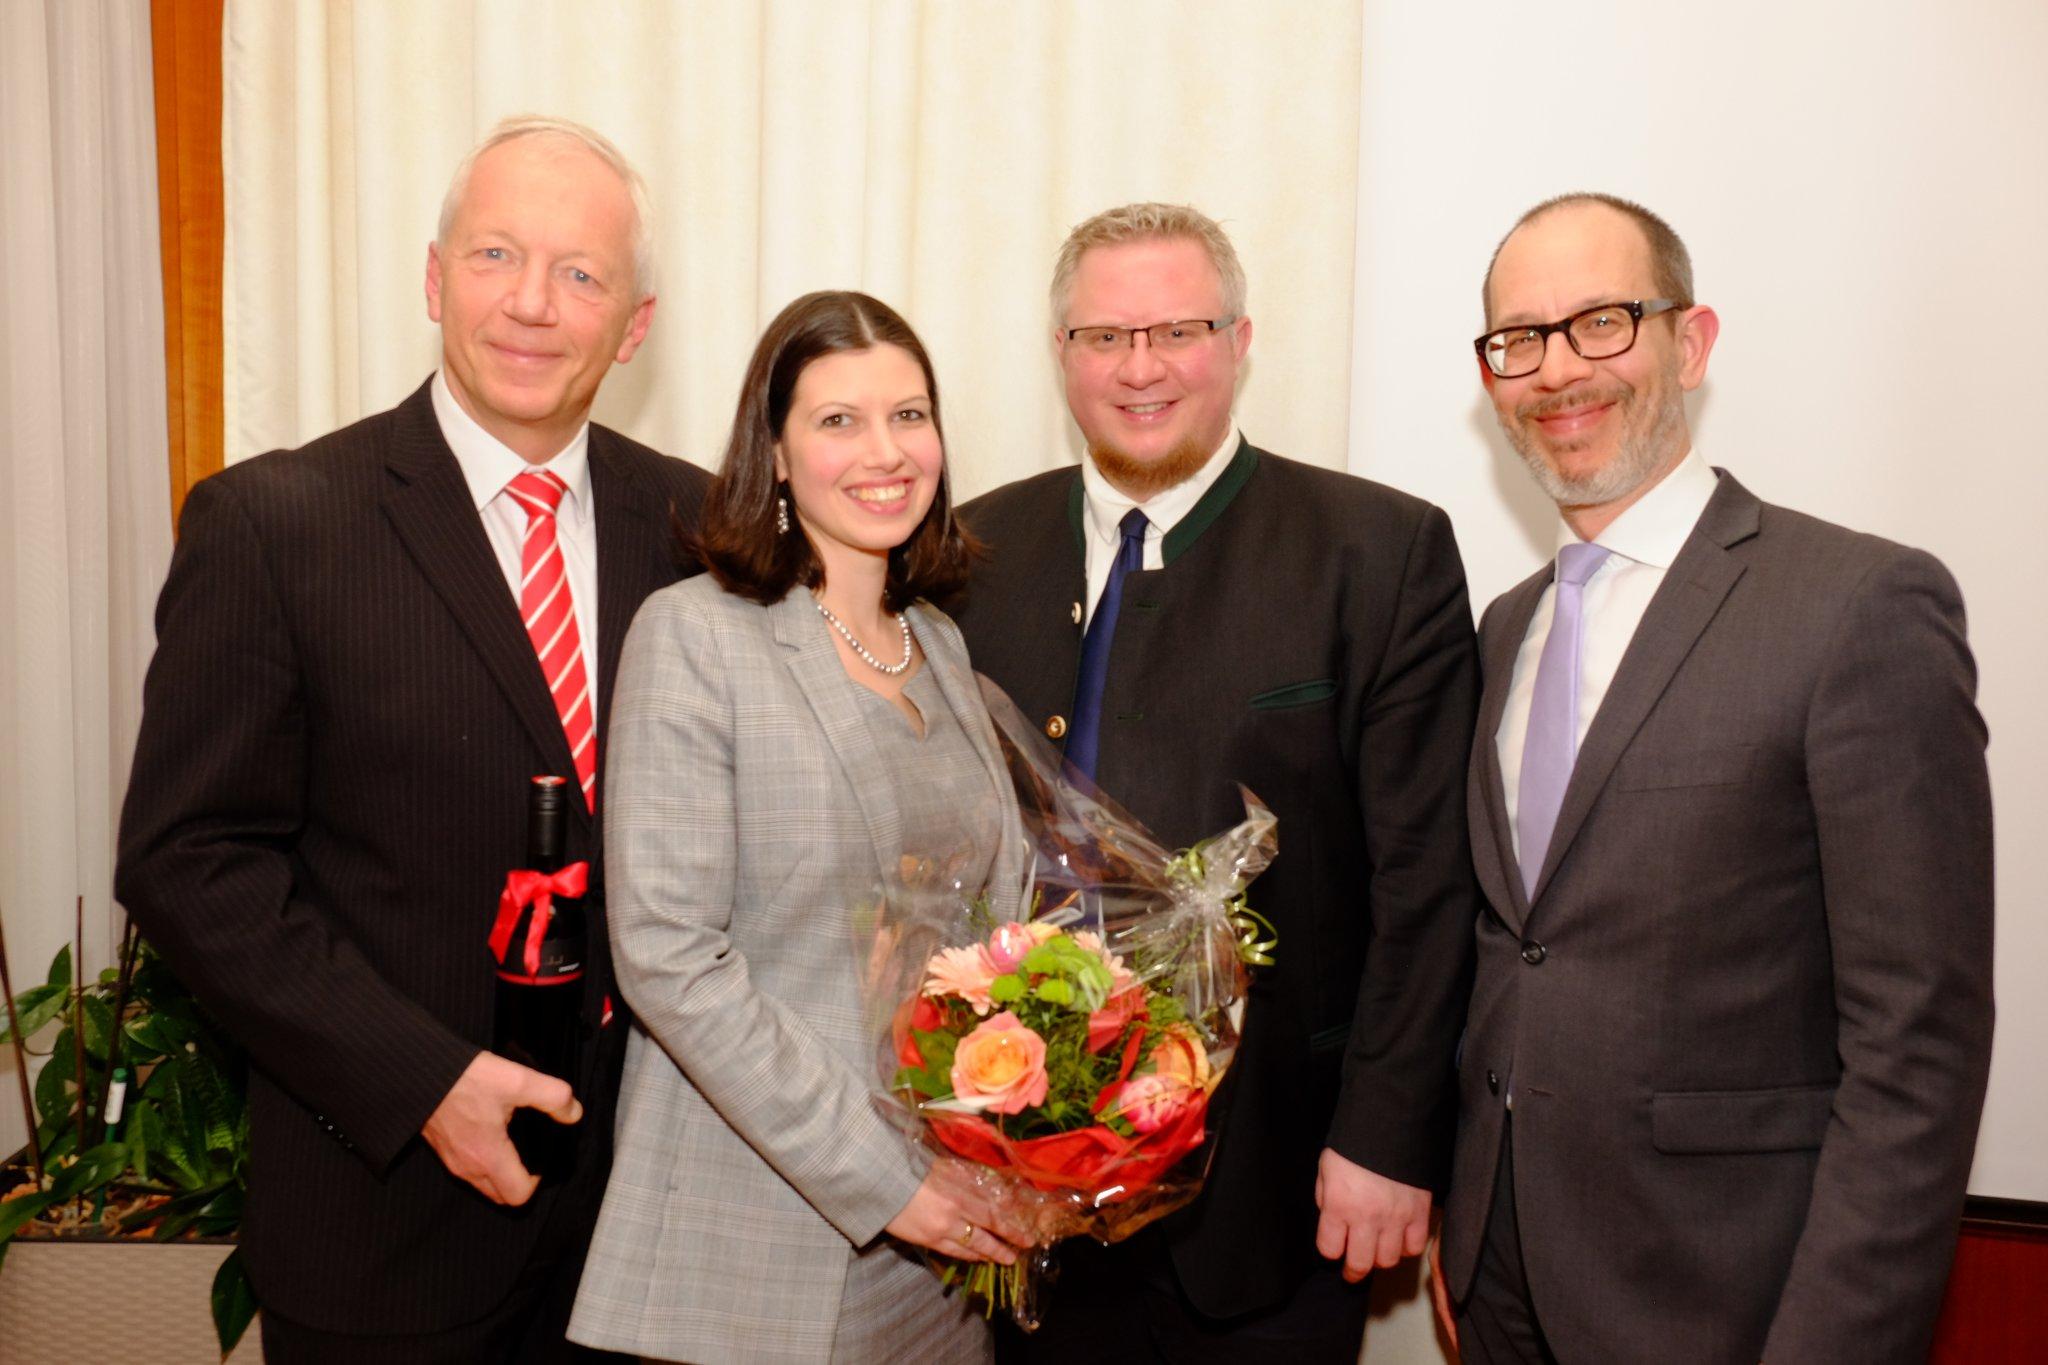 neue Vizebrgermeisterin in Altlengbach: 29-jhrige SP